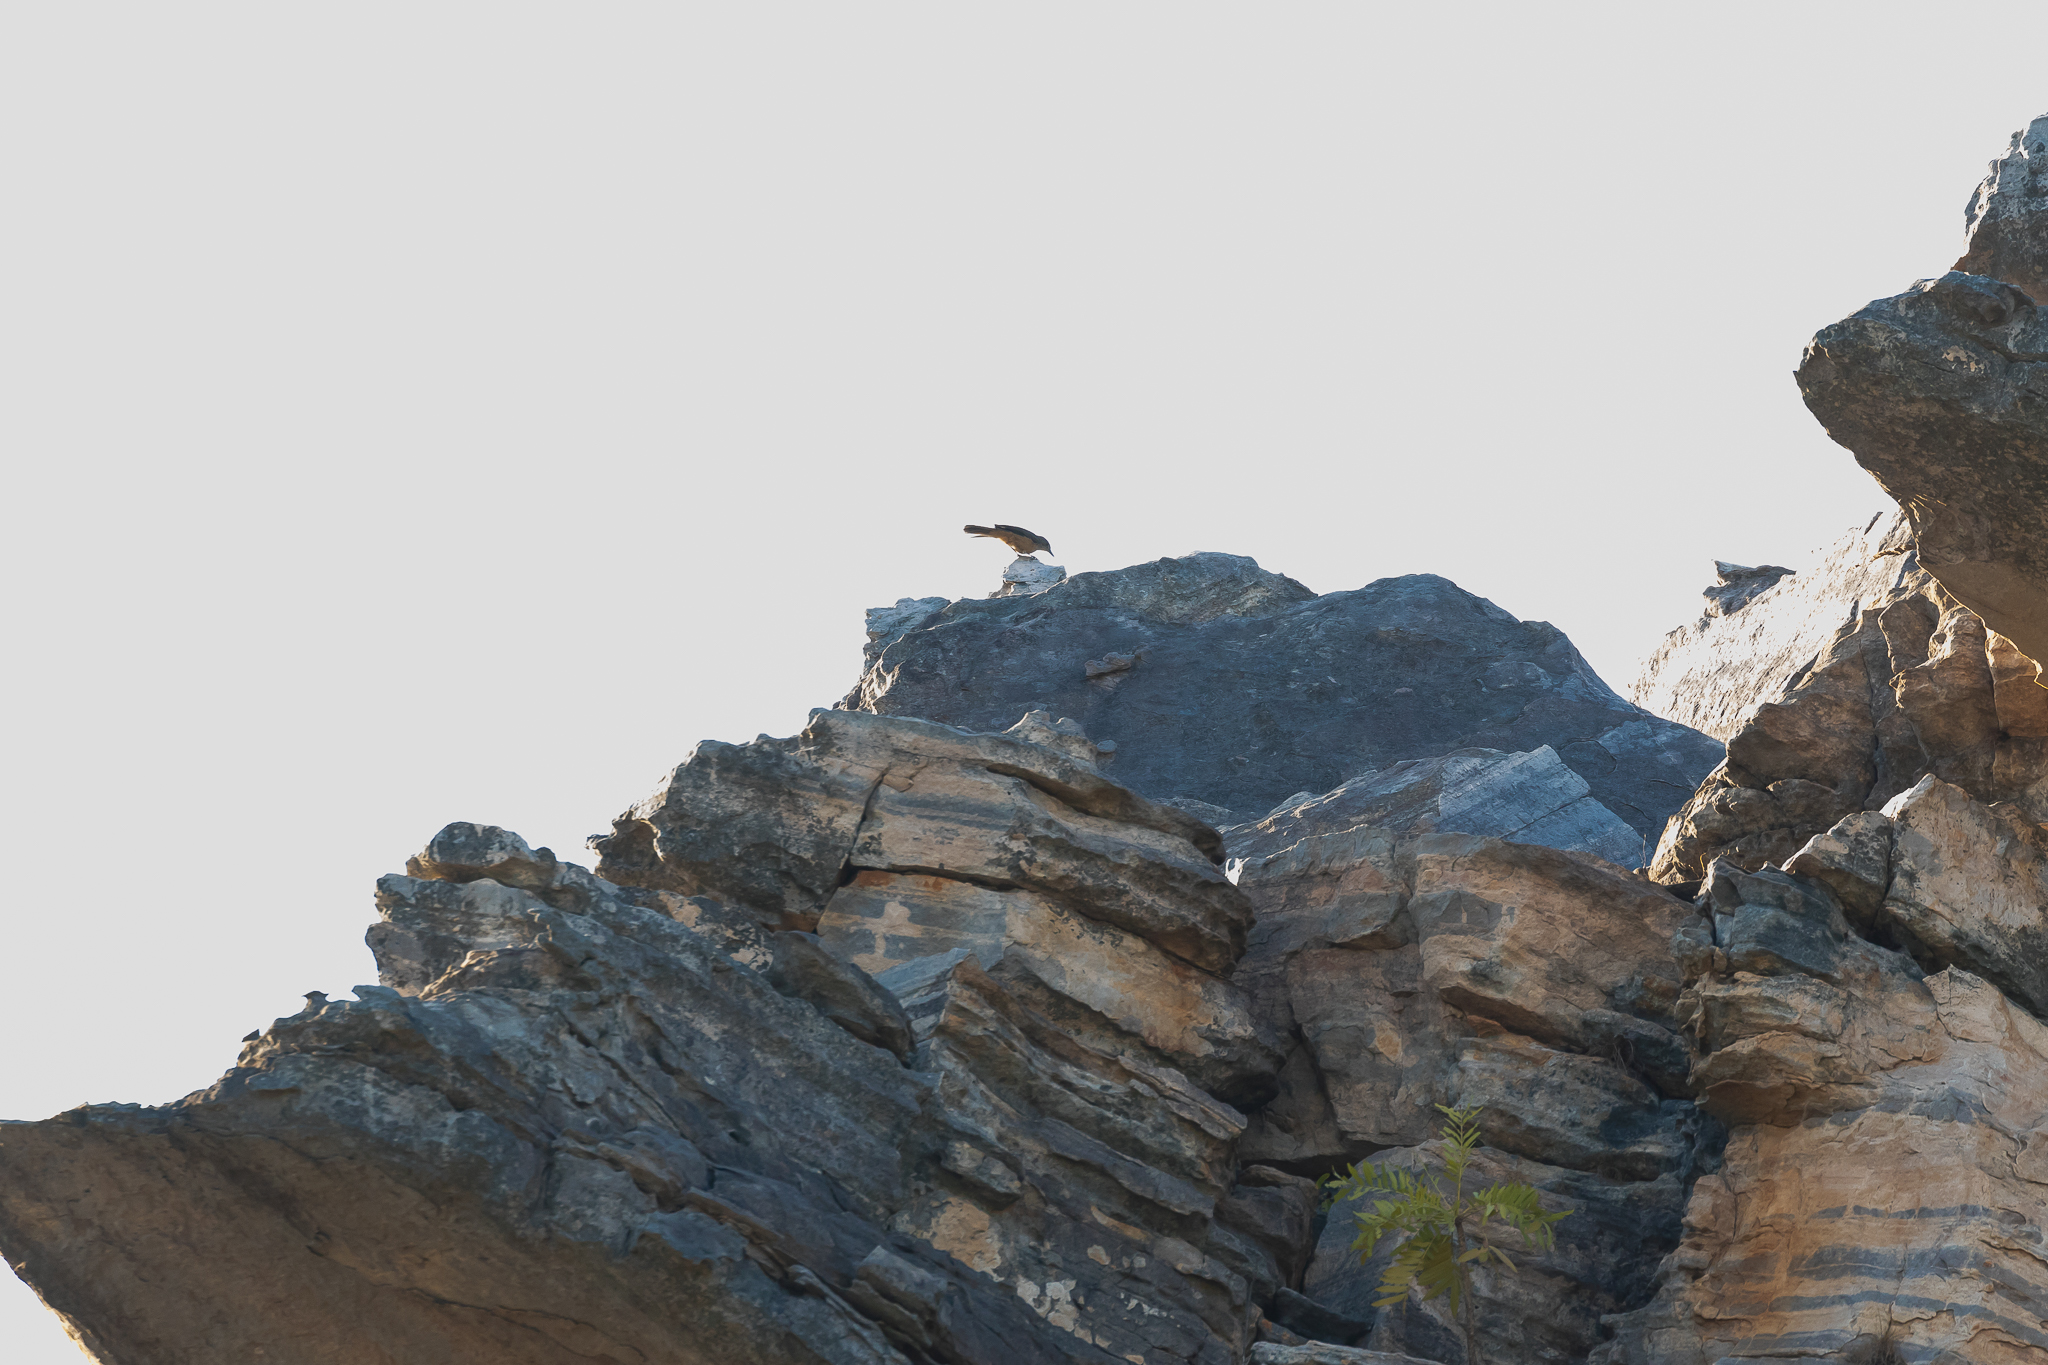 The Sandstone Shrike-thrush is seen high on Kakadu's rocky escarpments, probing the rocks for lizards, grasshoppers and spiders.